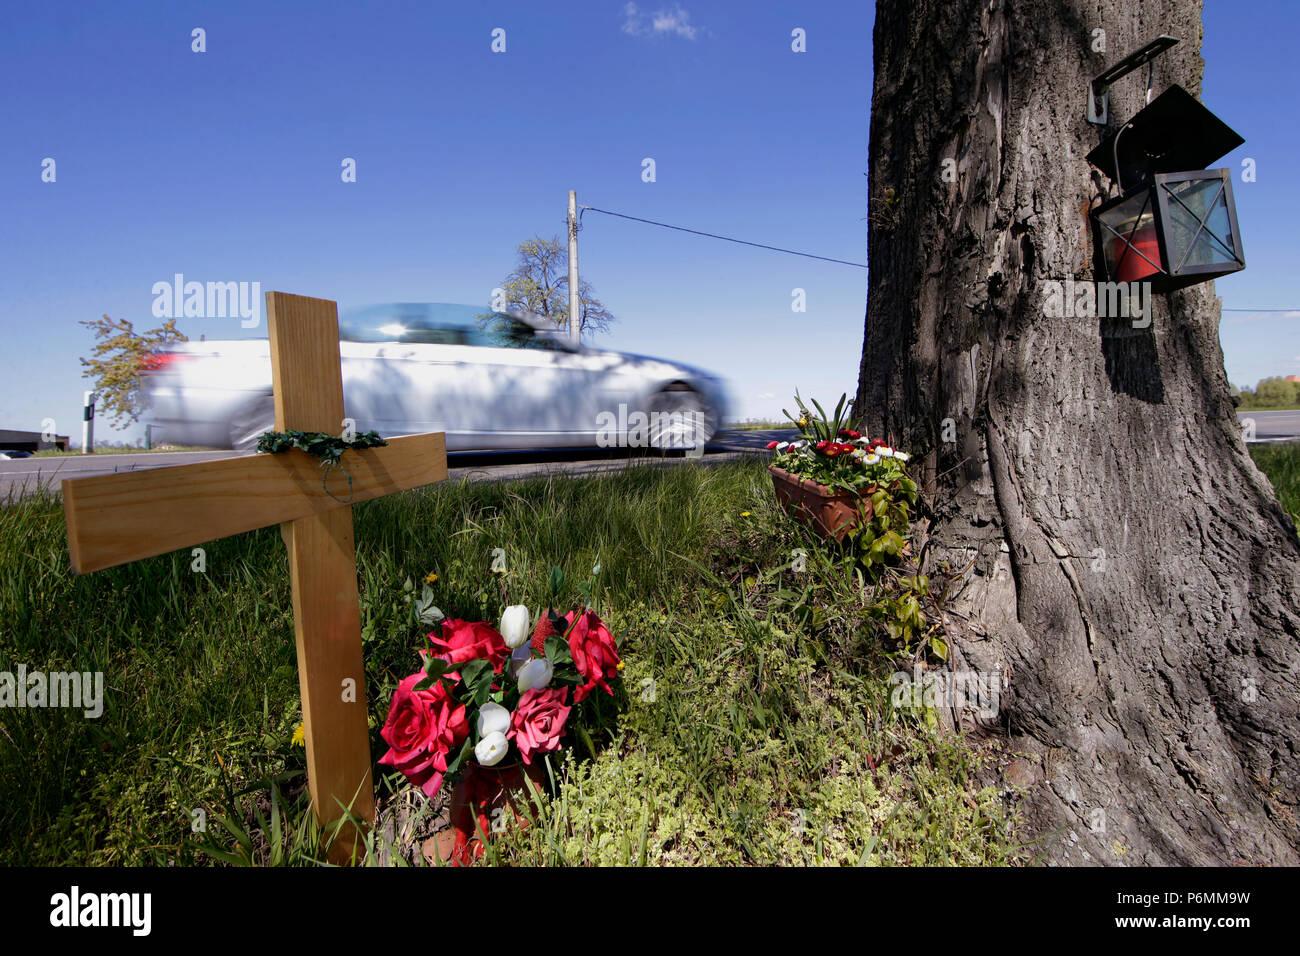 Graditz, Germany - Commemorative cross for a traffic victim on the roadside - Stock Image